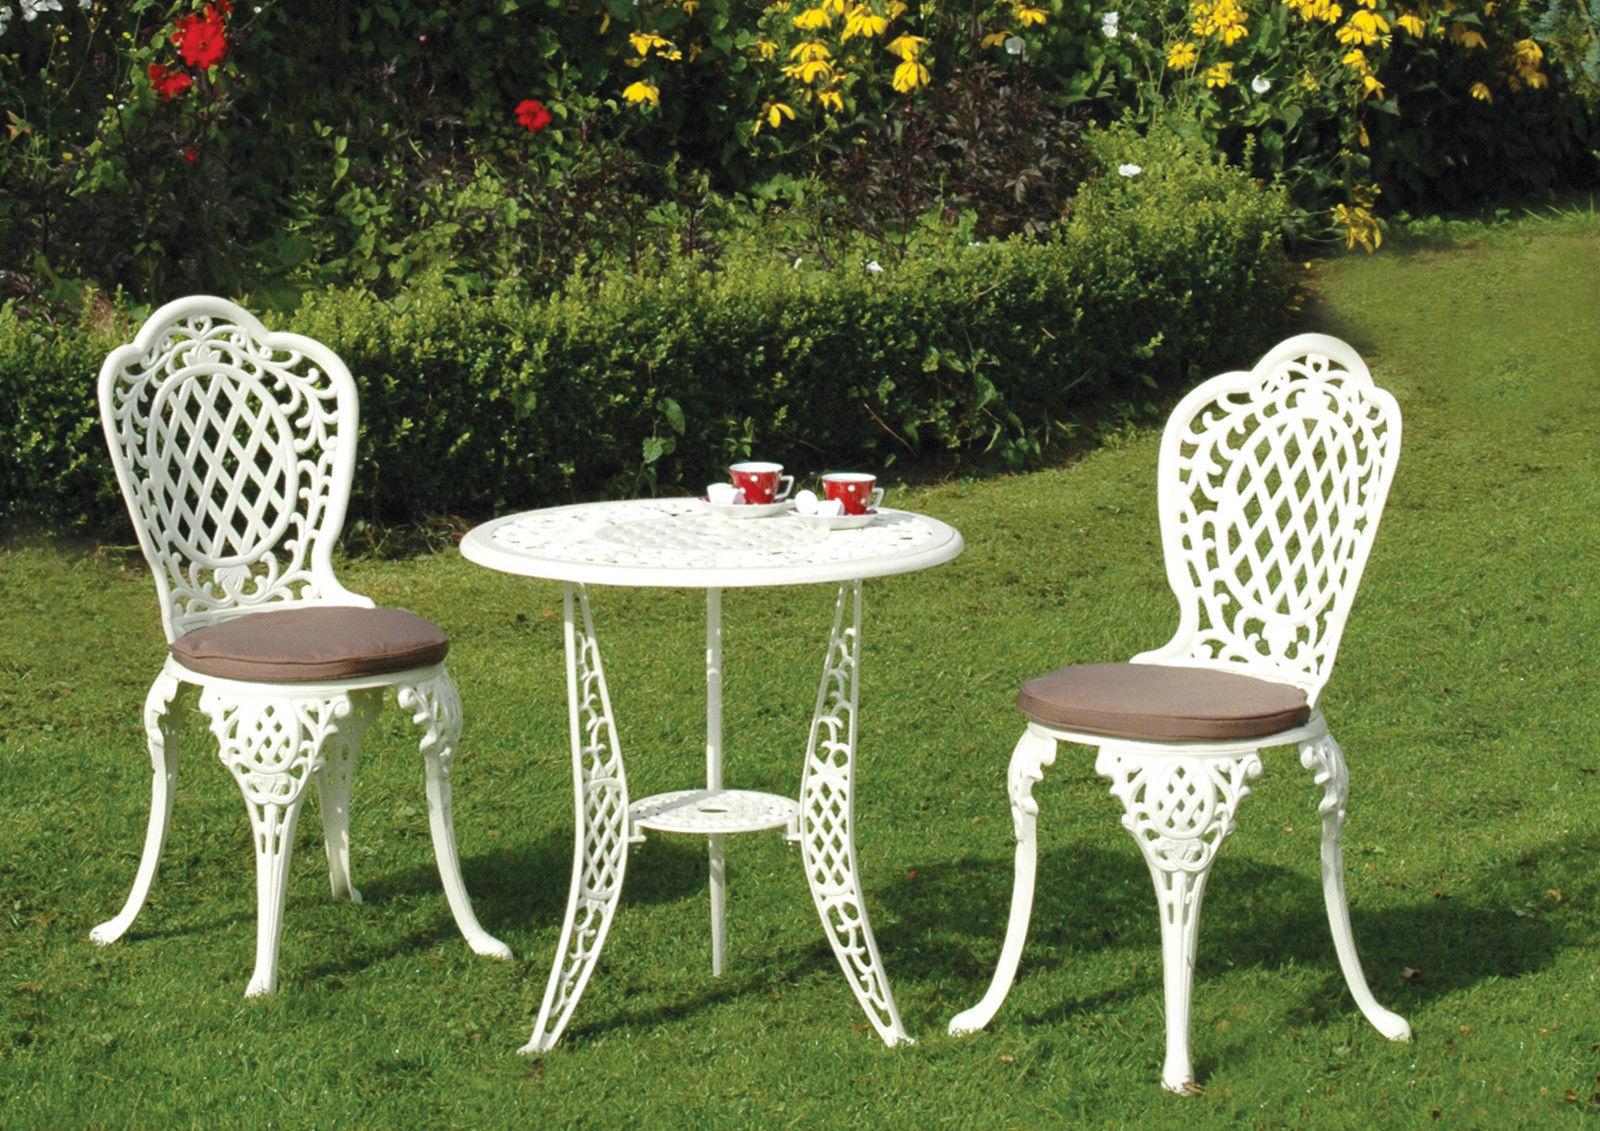 Mercer Mississippi Cream Garden Outdoor Bistro Chair 2 seater Table Patio Set